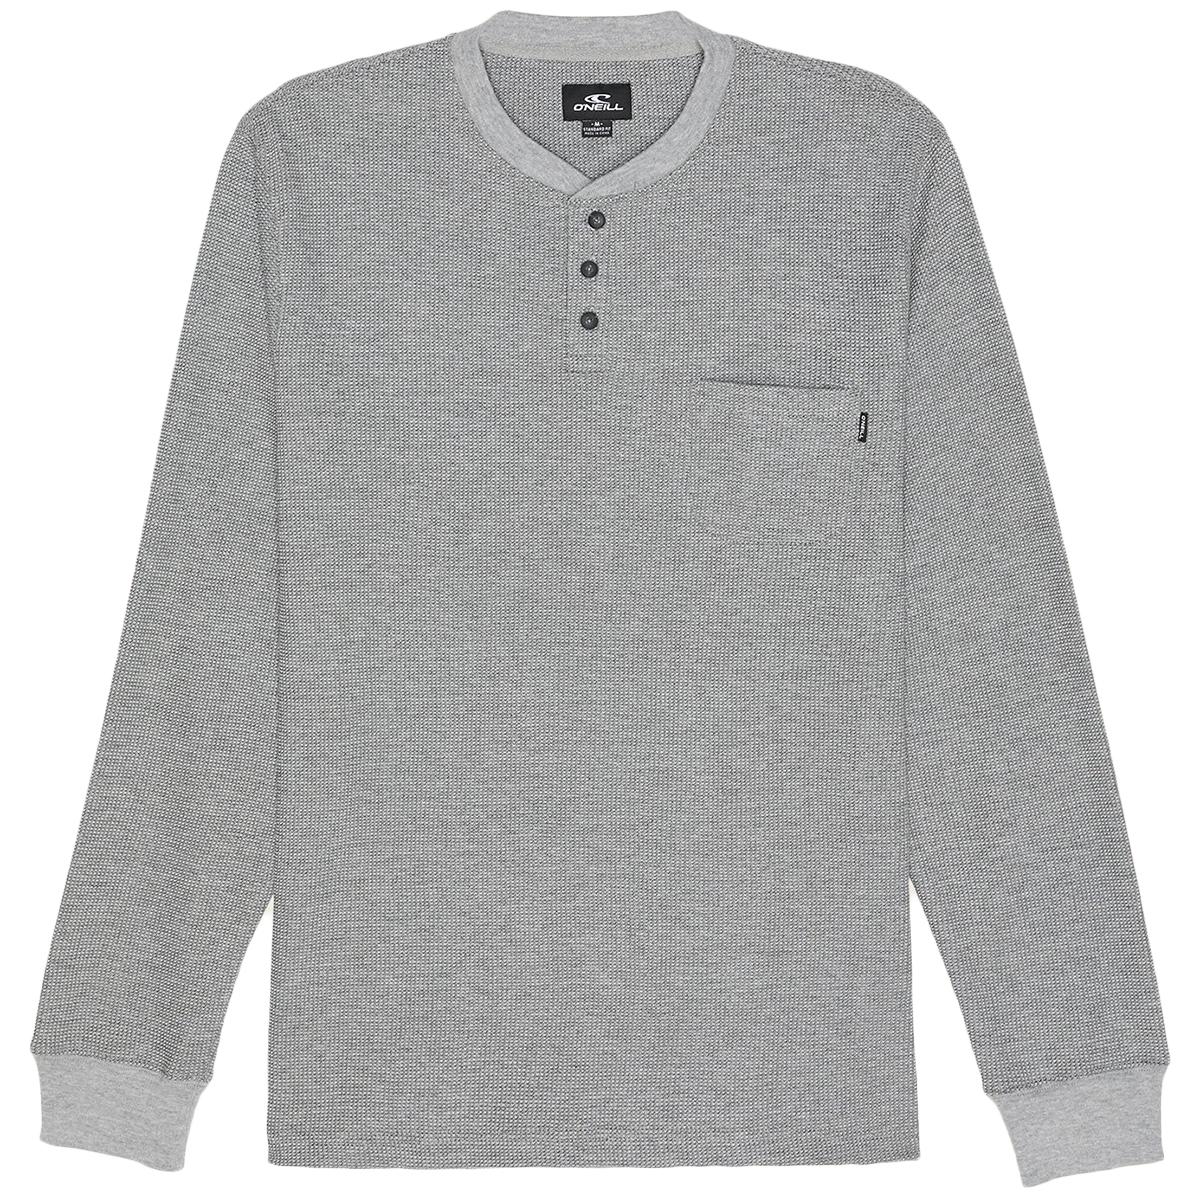 O'neill Men's Olympia Long-Sleeve Henley Shirt - Black, XL